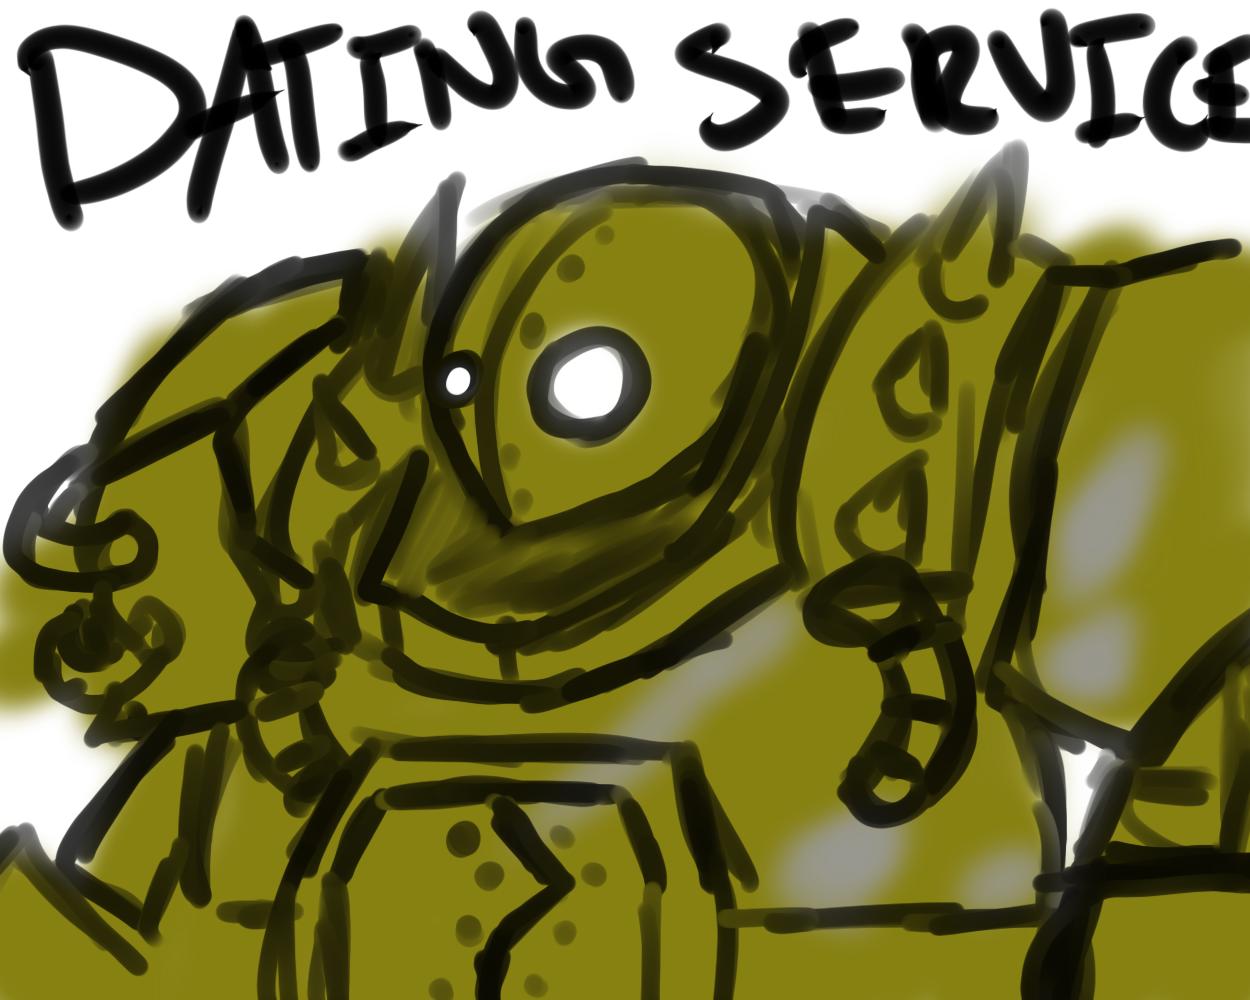 Blitzcranks dating service